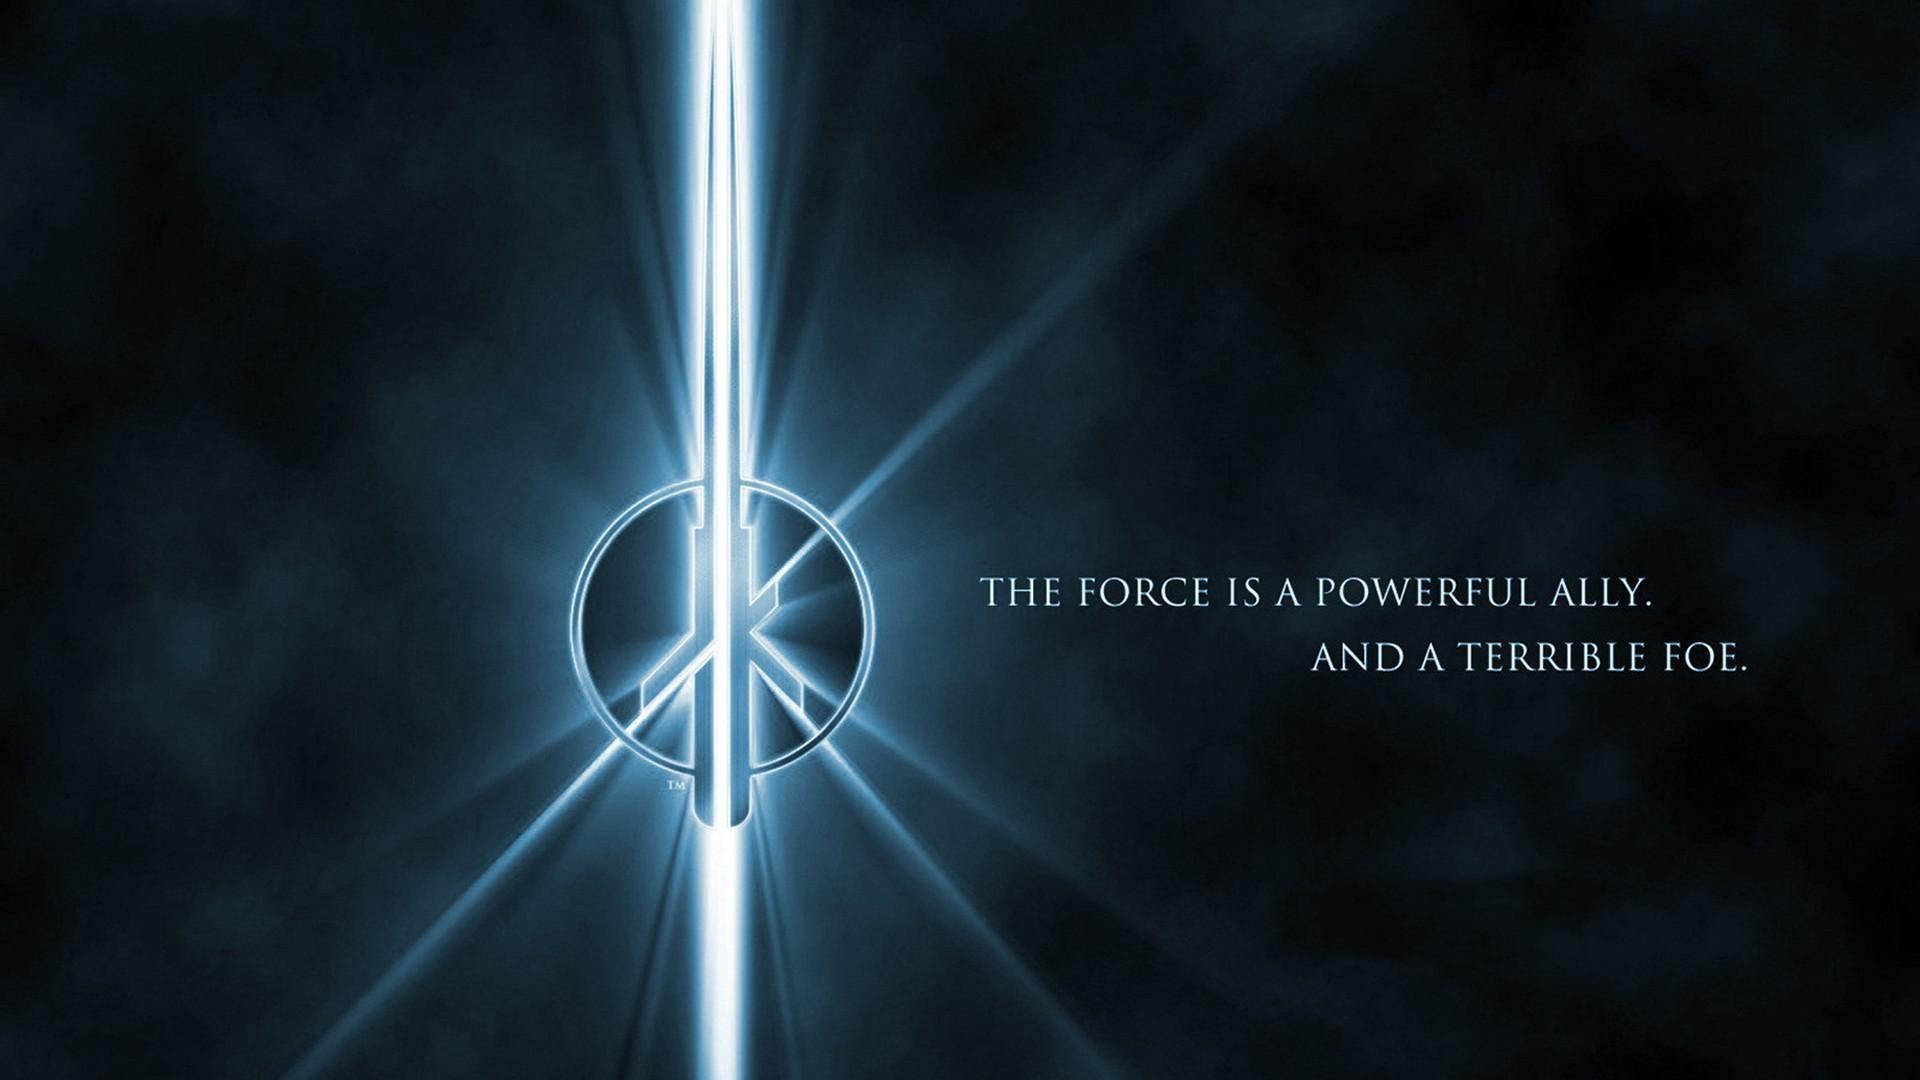 Star wars jedi battle wallpaper – photo#12